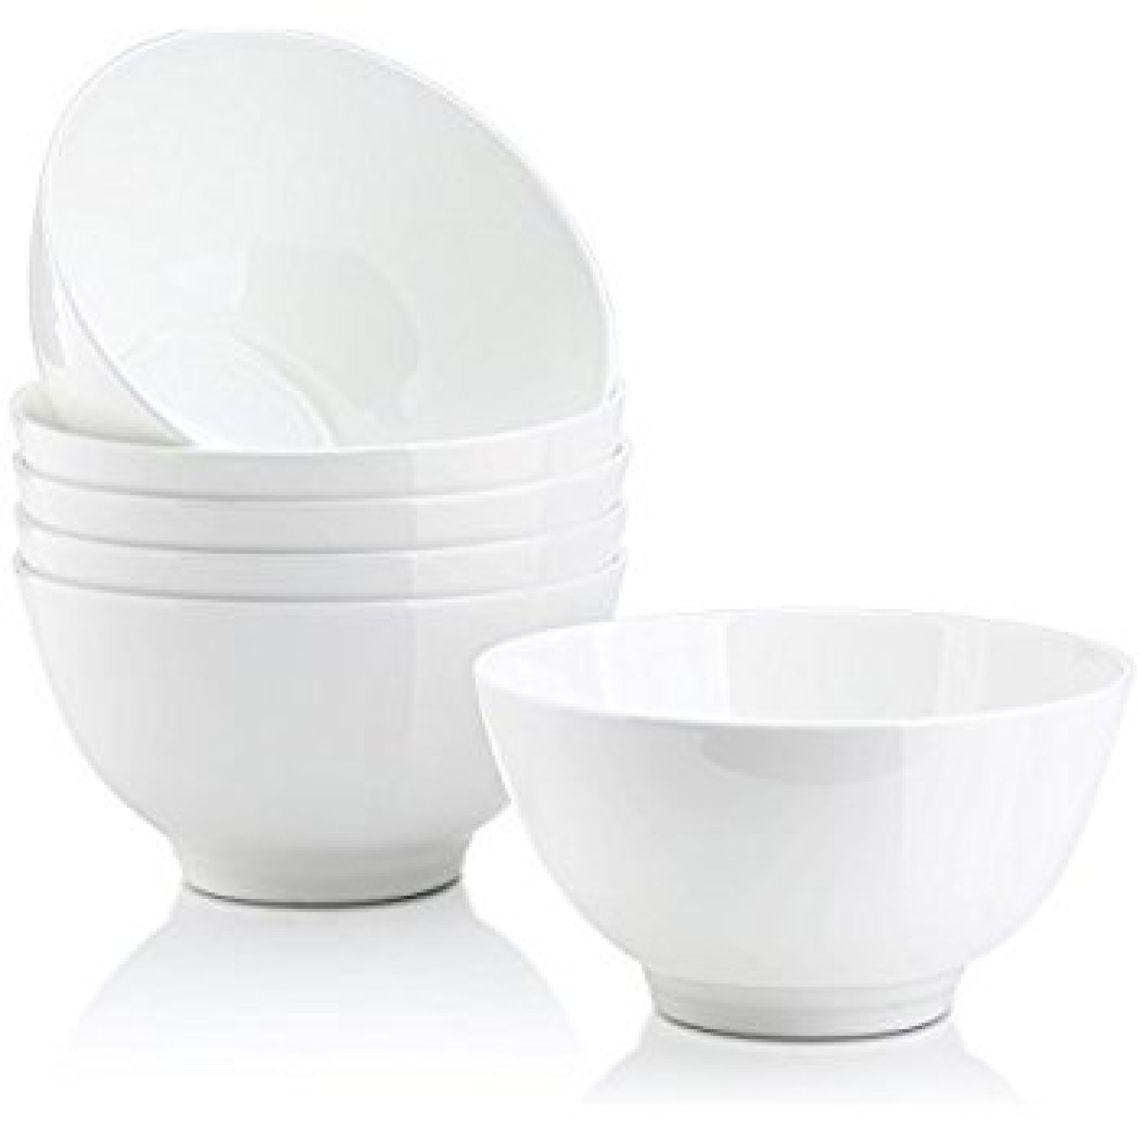 Amazon.com | DOWAN 14-Ounce Bone China Bowl Sets, White Soup/Rice/Dessert Bowls, Set of 6 - Microwavable: Rice Bowls